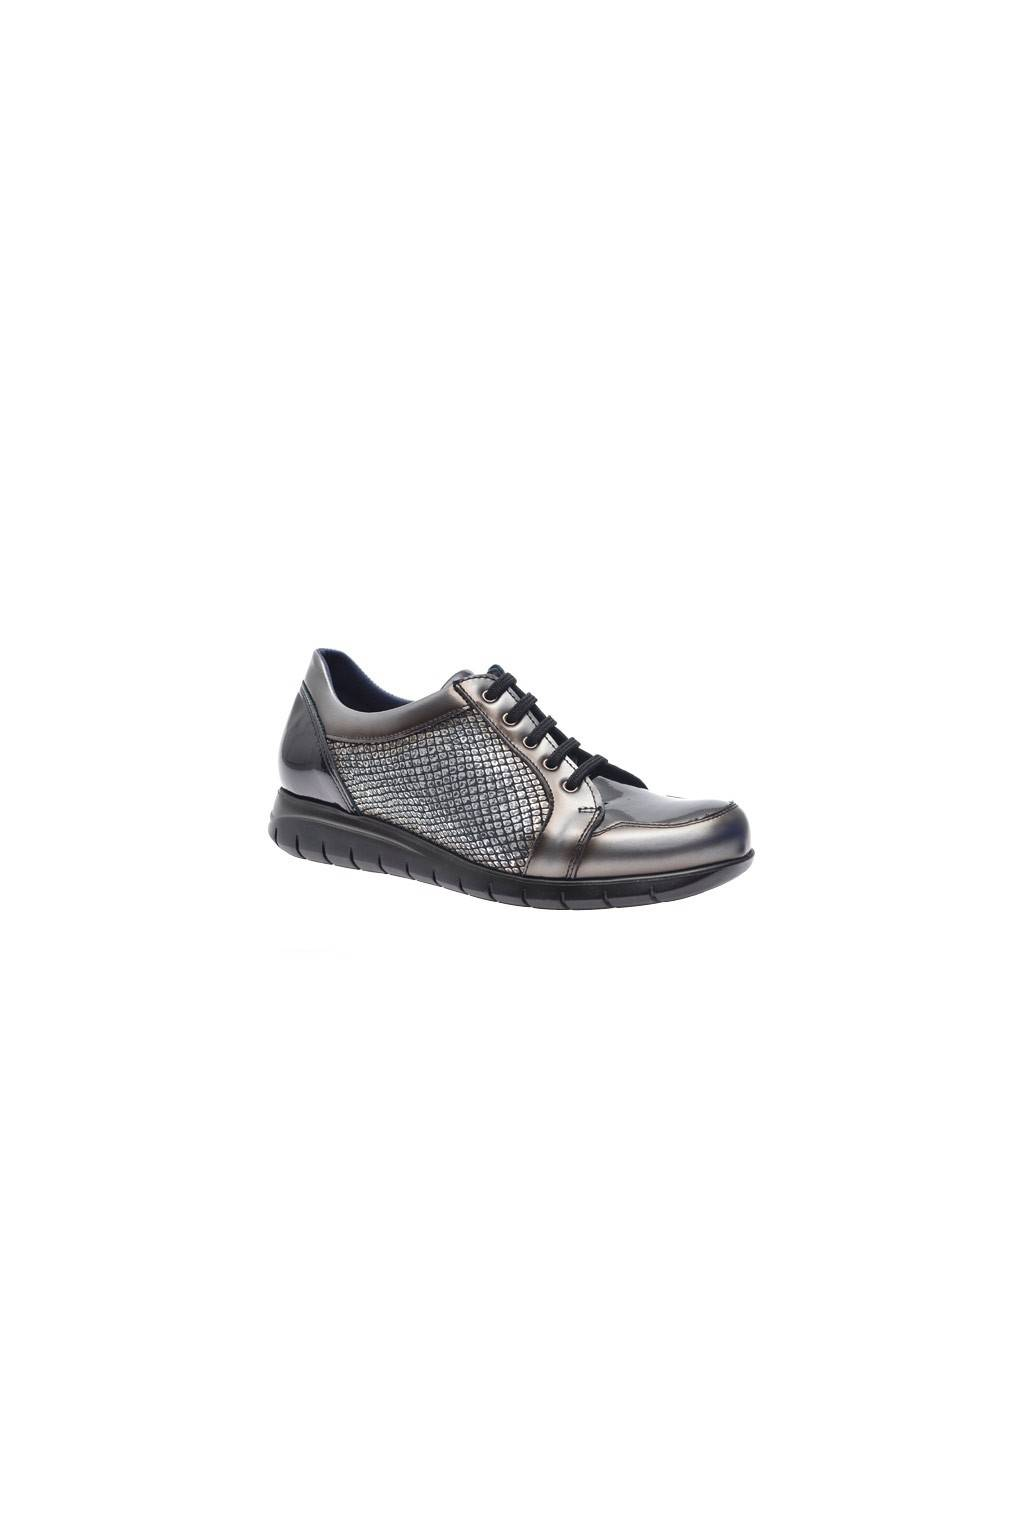 5997300e572 Tolino shoe 15011 - medinapiel.es